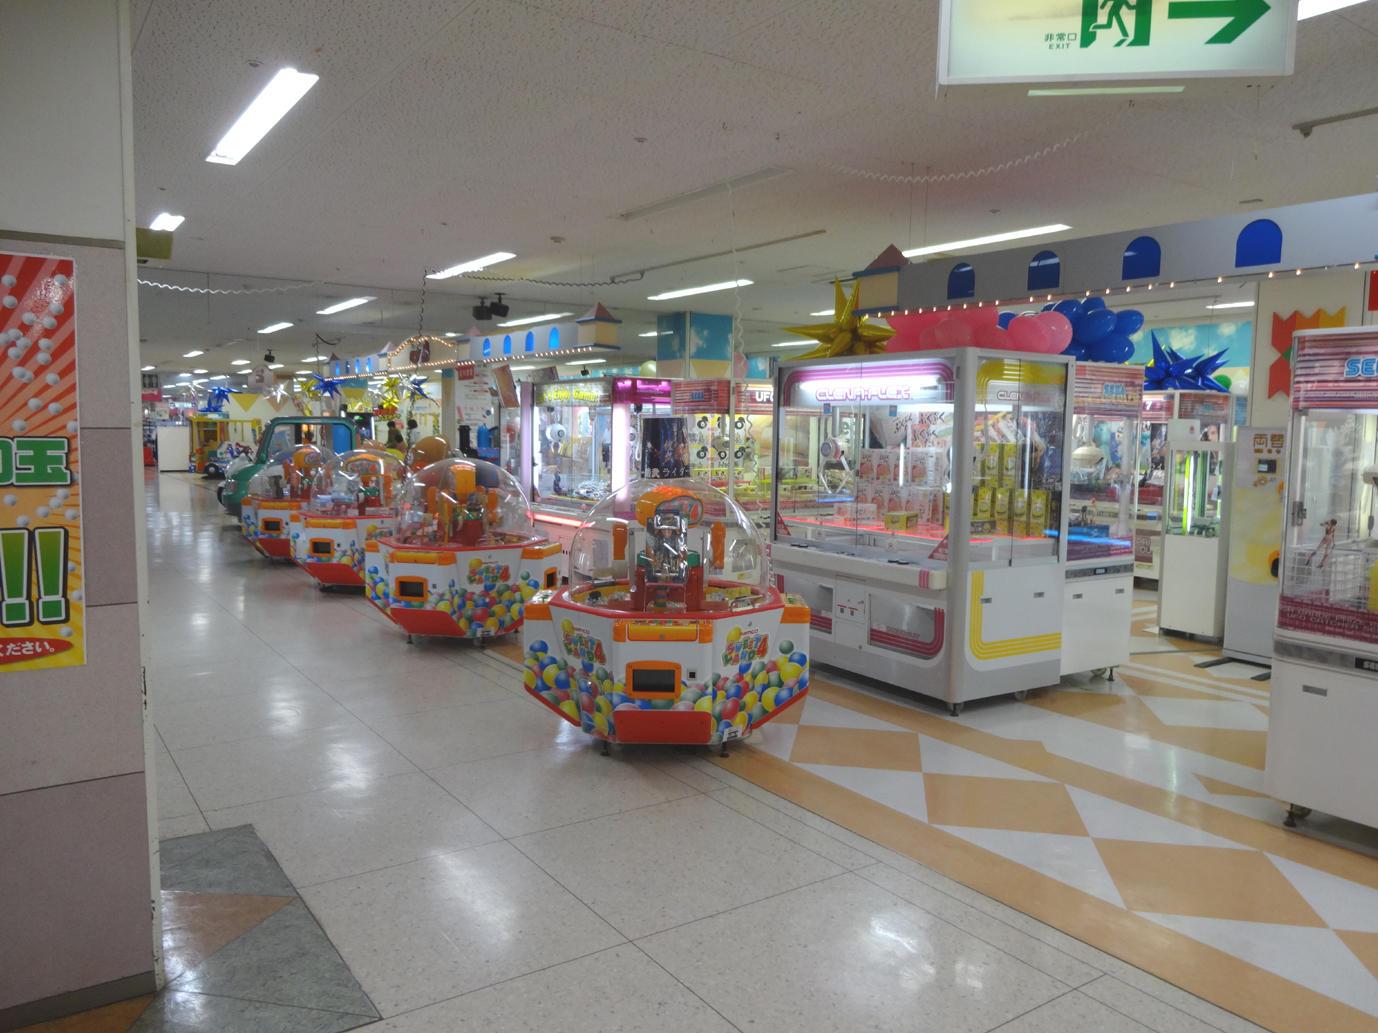 PS吉田店②